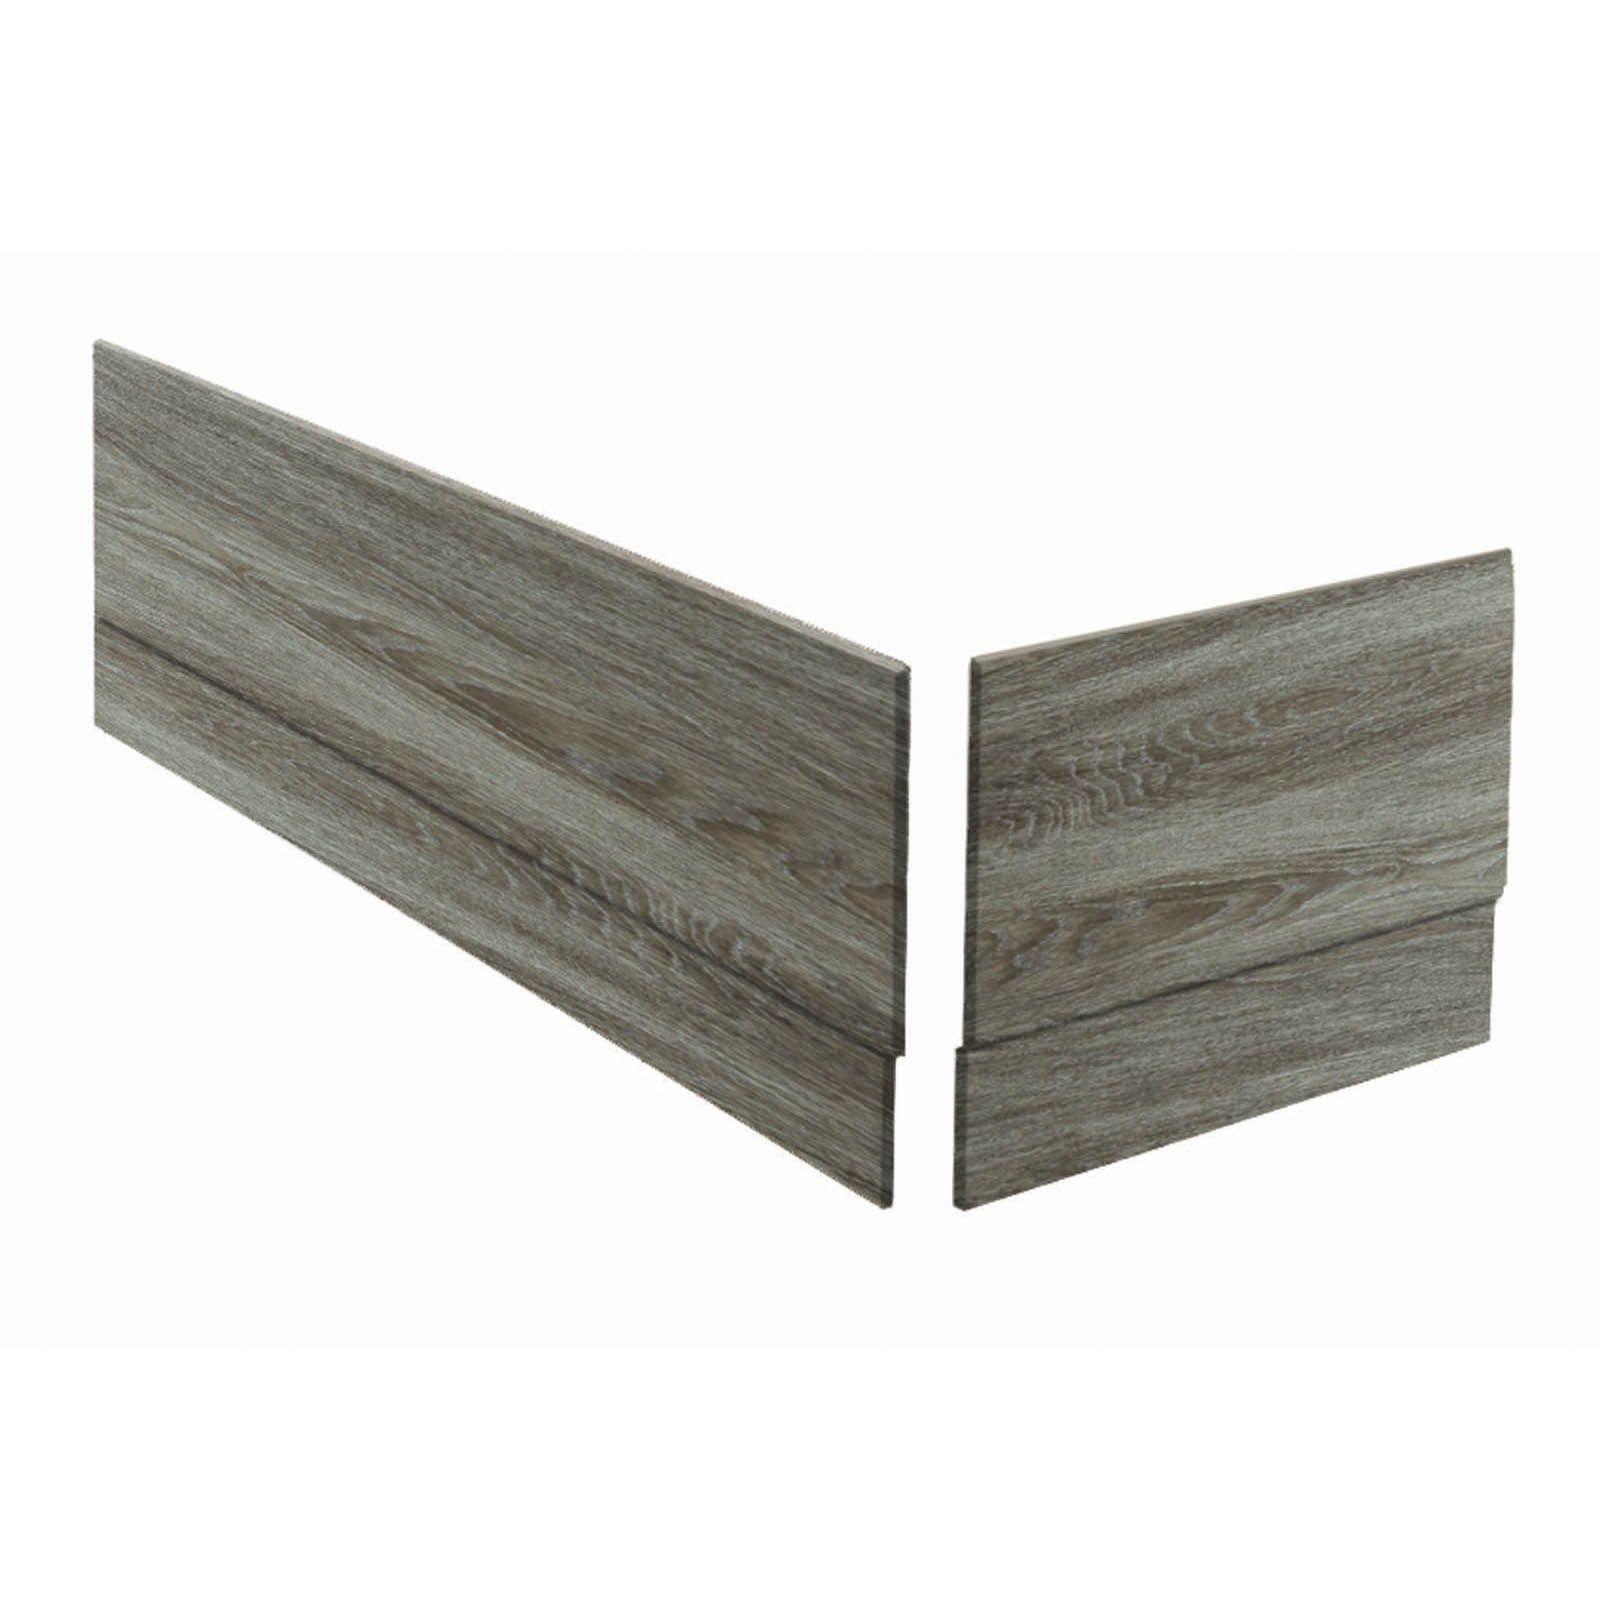 AQUA-line  Bath Panel - Avola